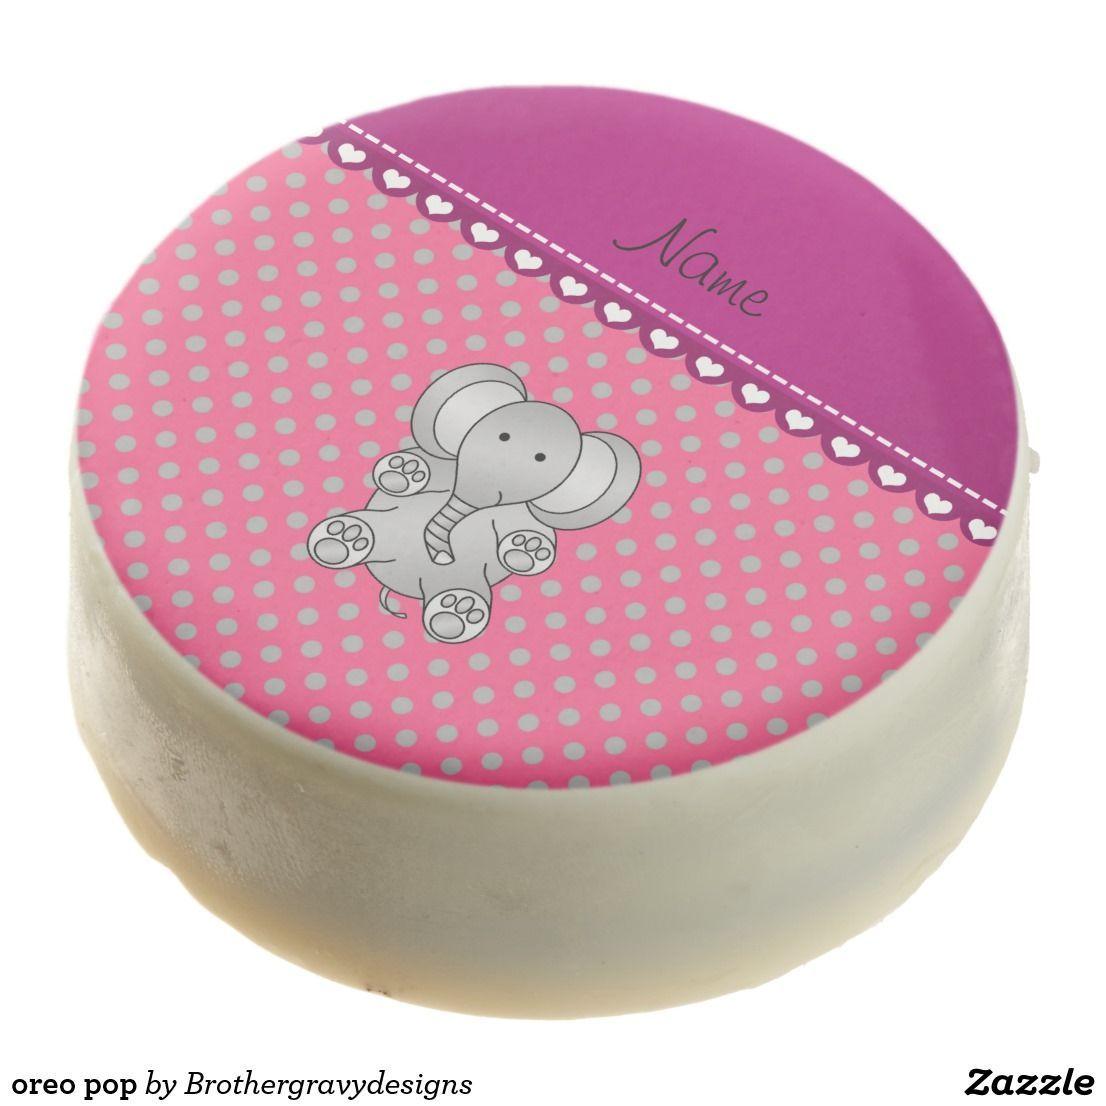 oreo pop | Zazzle.com #oreopops oreo pop #oreopops